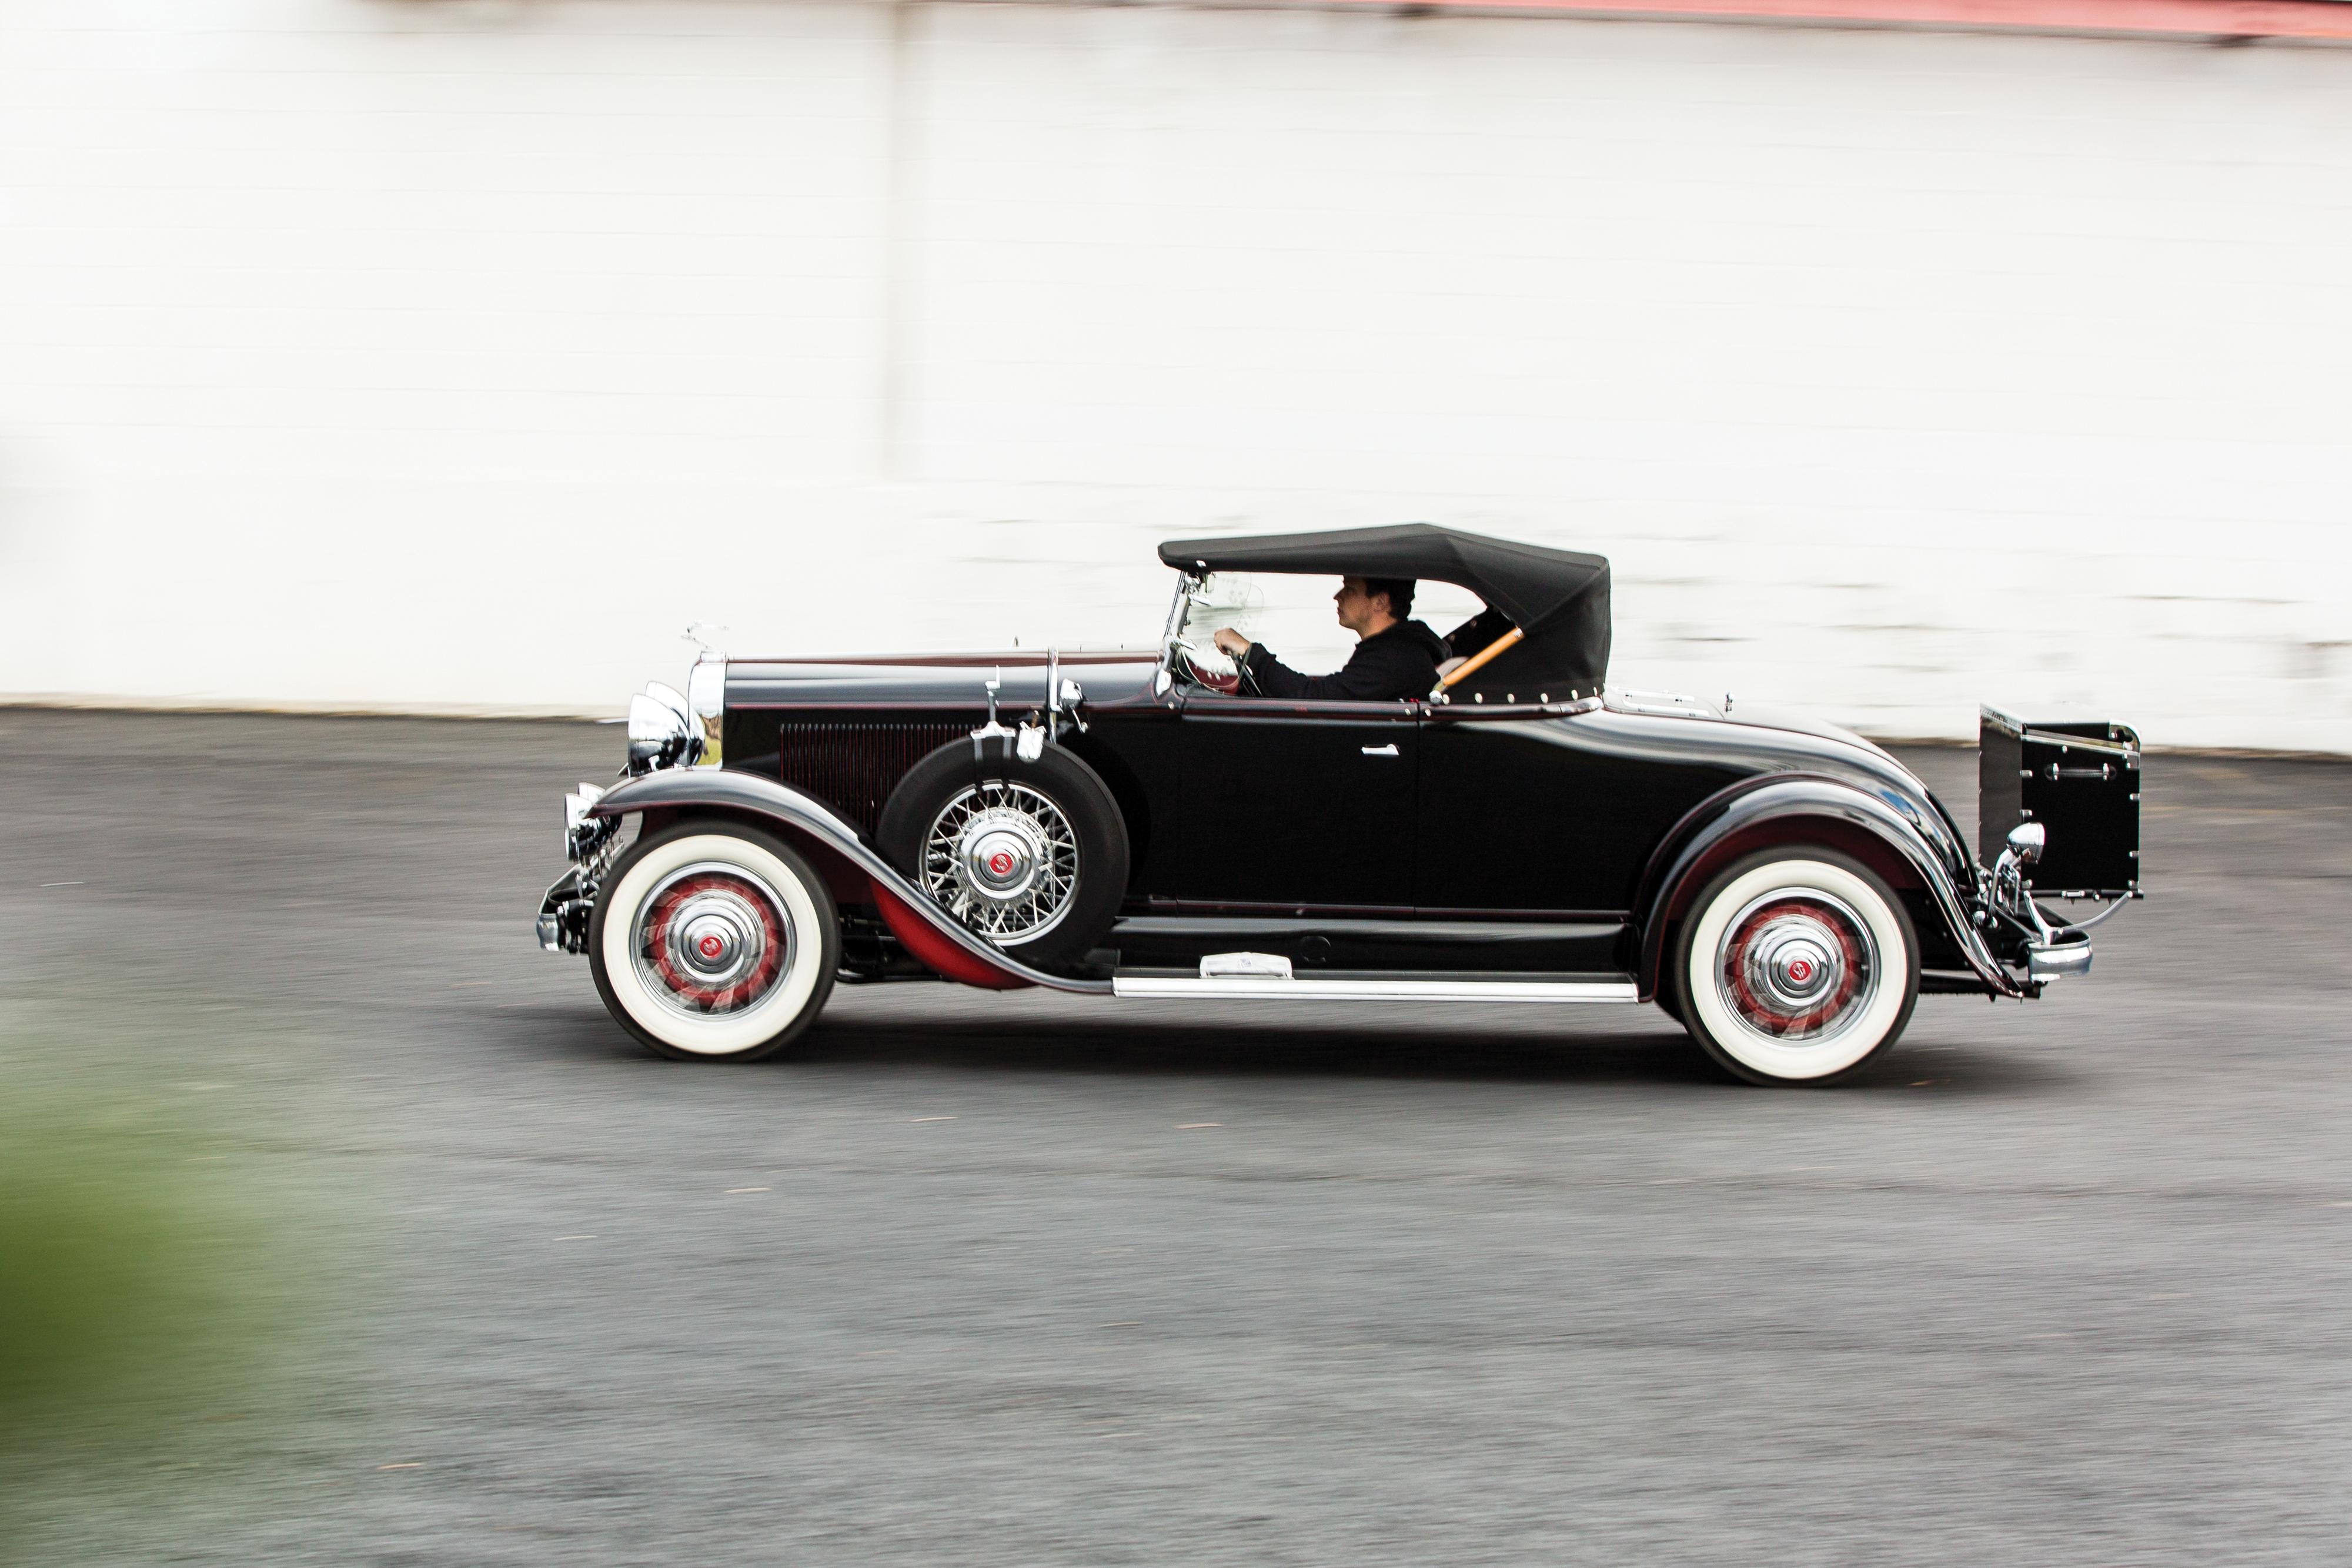 High Resolution Wallpaper | 1931 Buick 94 Roadster 4000x2667 px